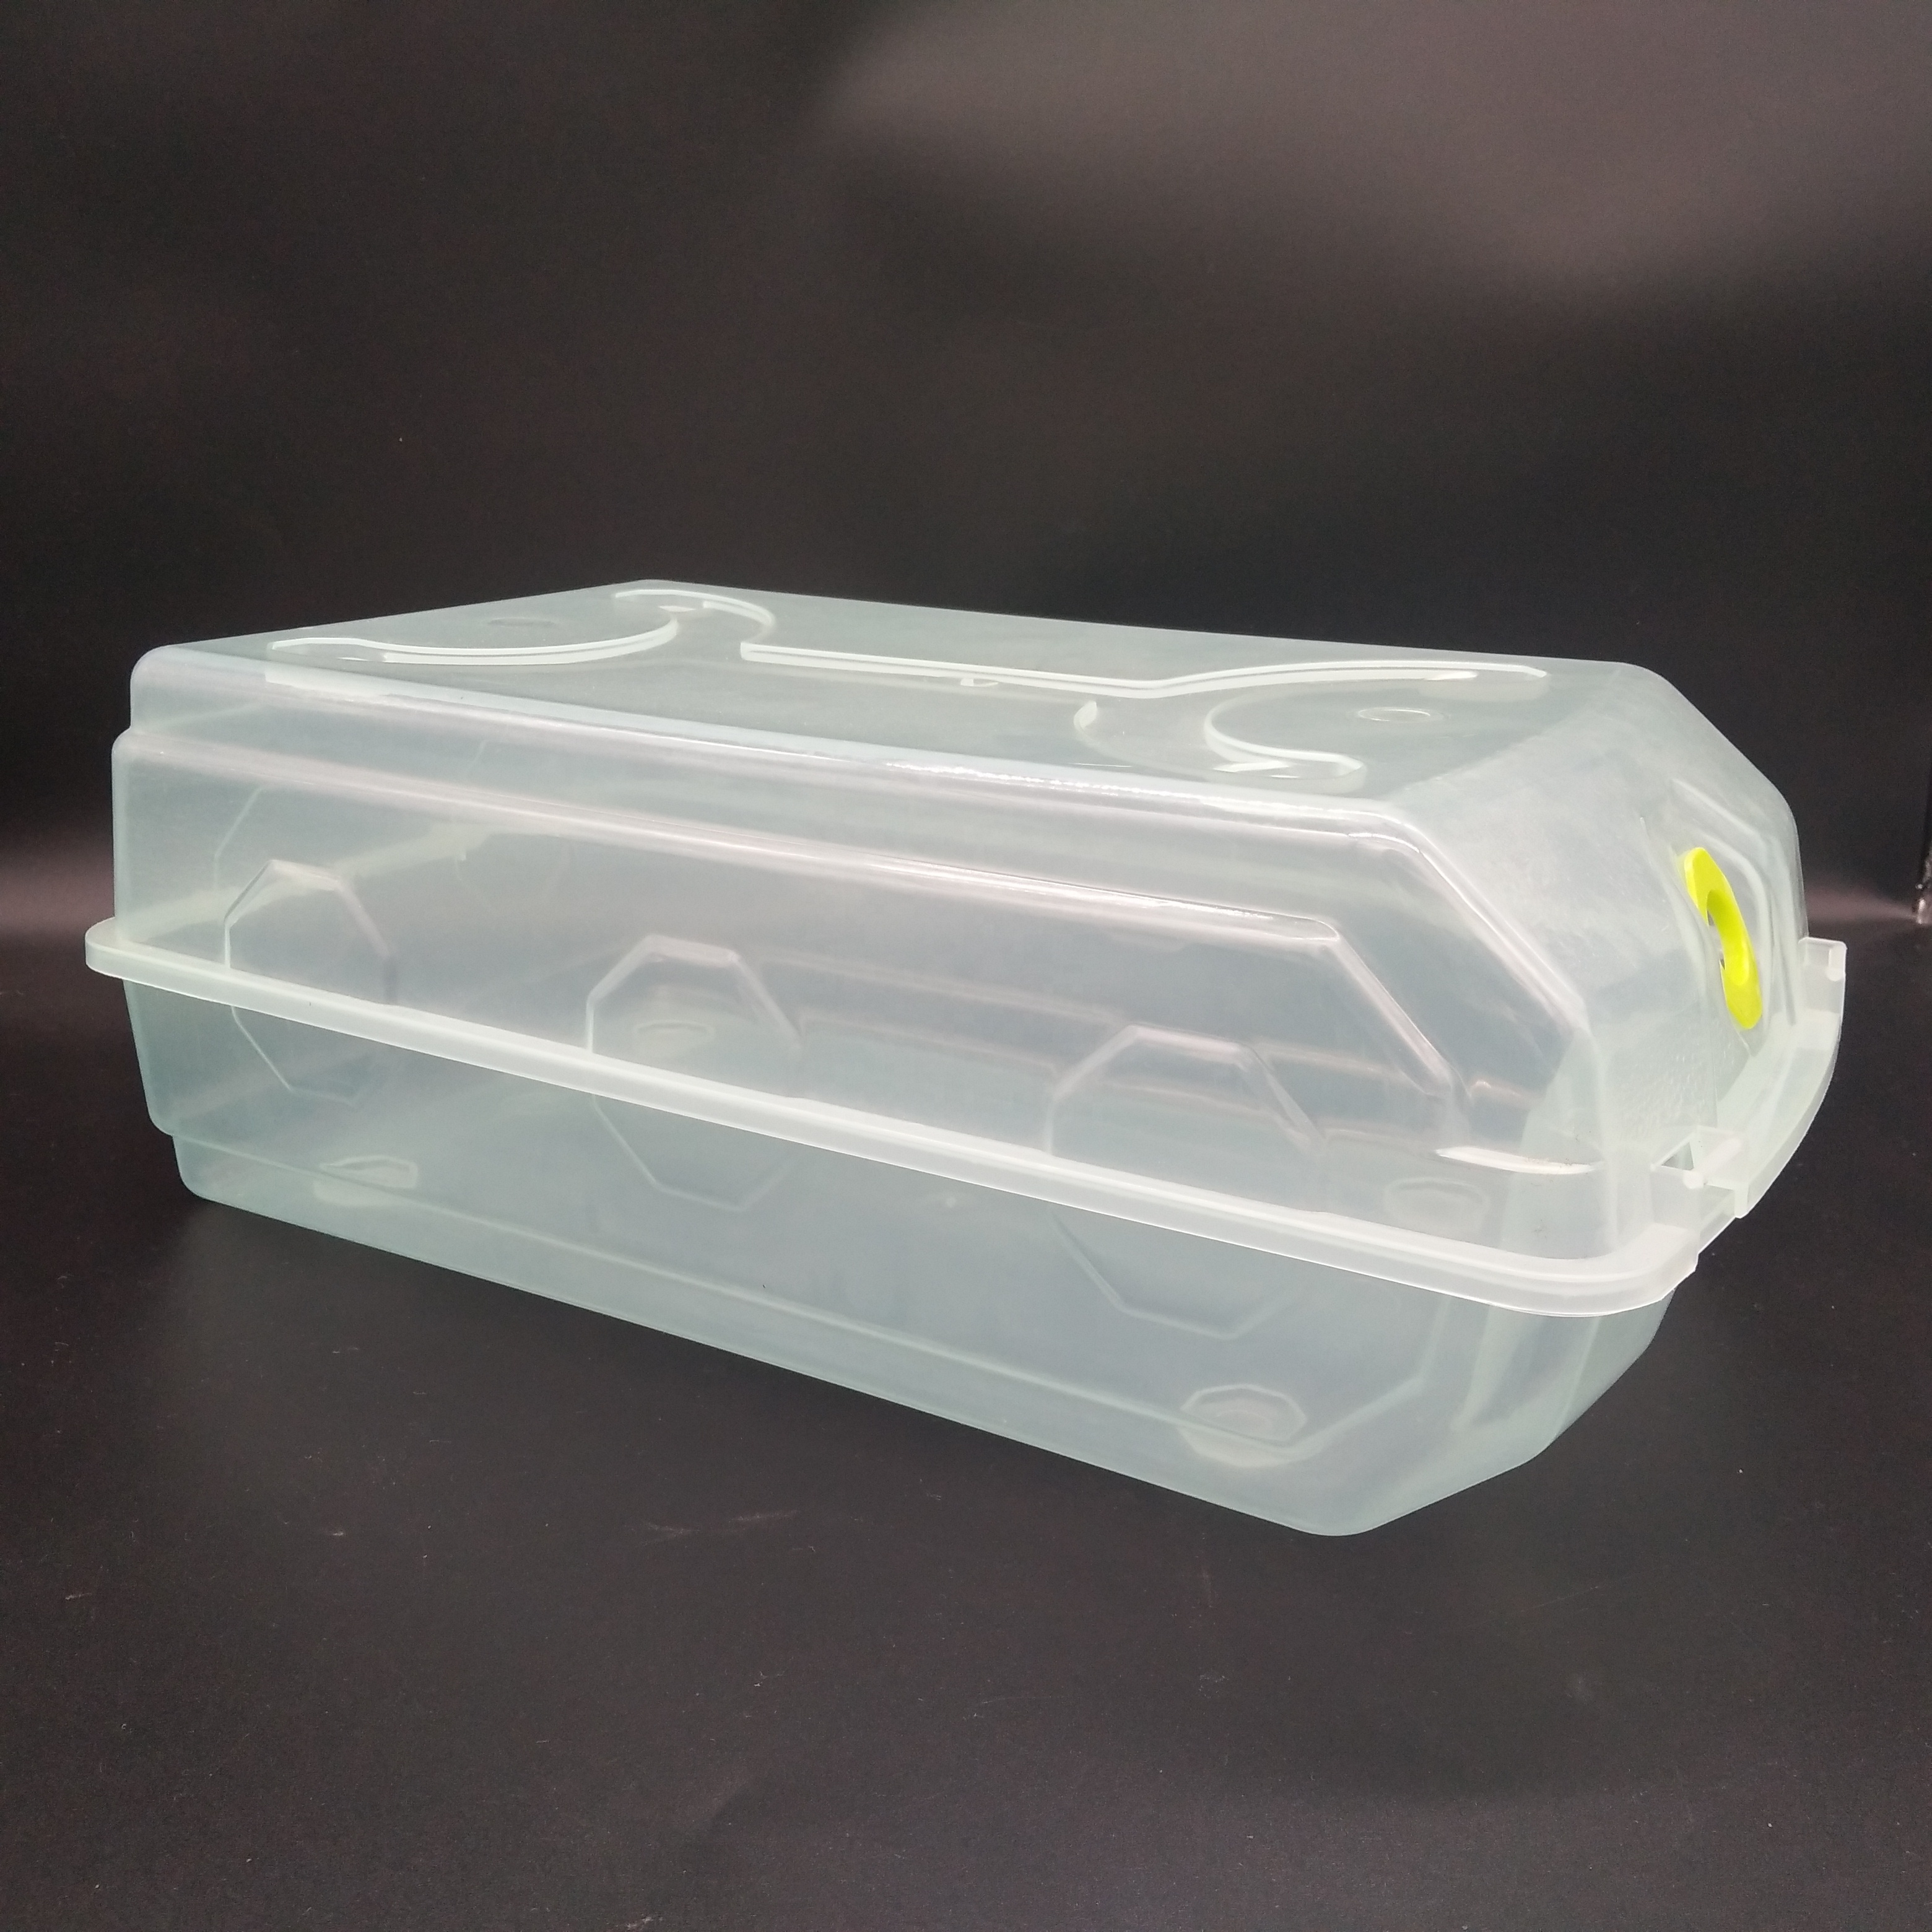 Faltbare Klar Kunststoff Schuh Boxen Stapelbar Floding DIY